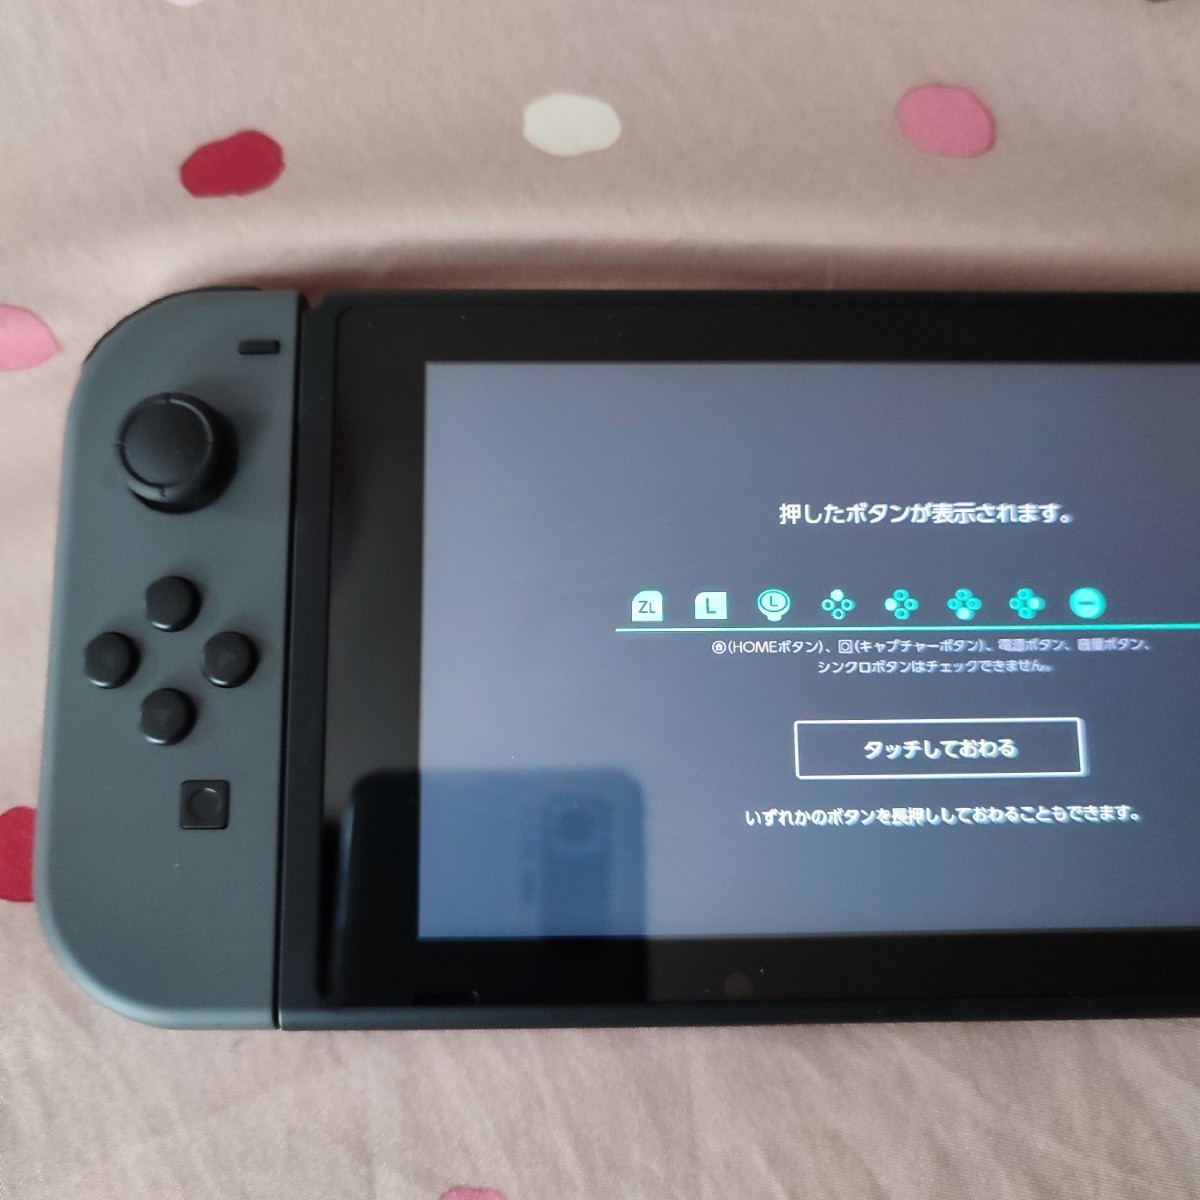 Nintendo Switch スイッチ 本体 + 周辺機器一式 中古 任天堂 2021年型 新型 おまけ(あつ森ケース)